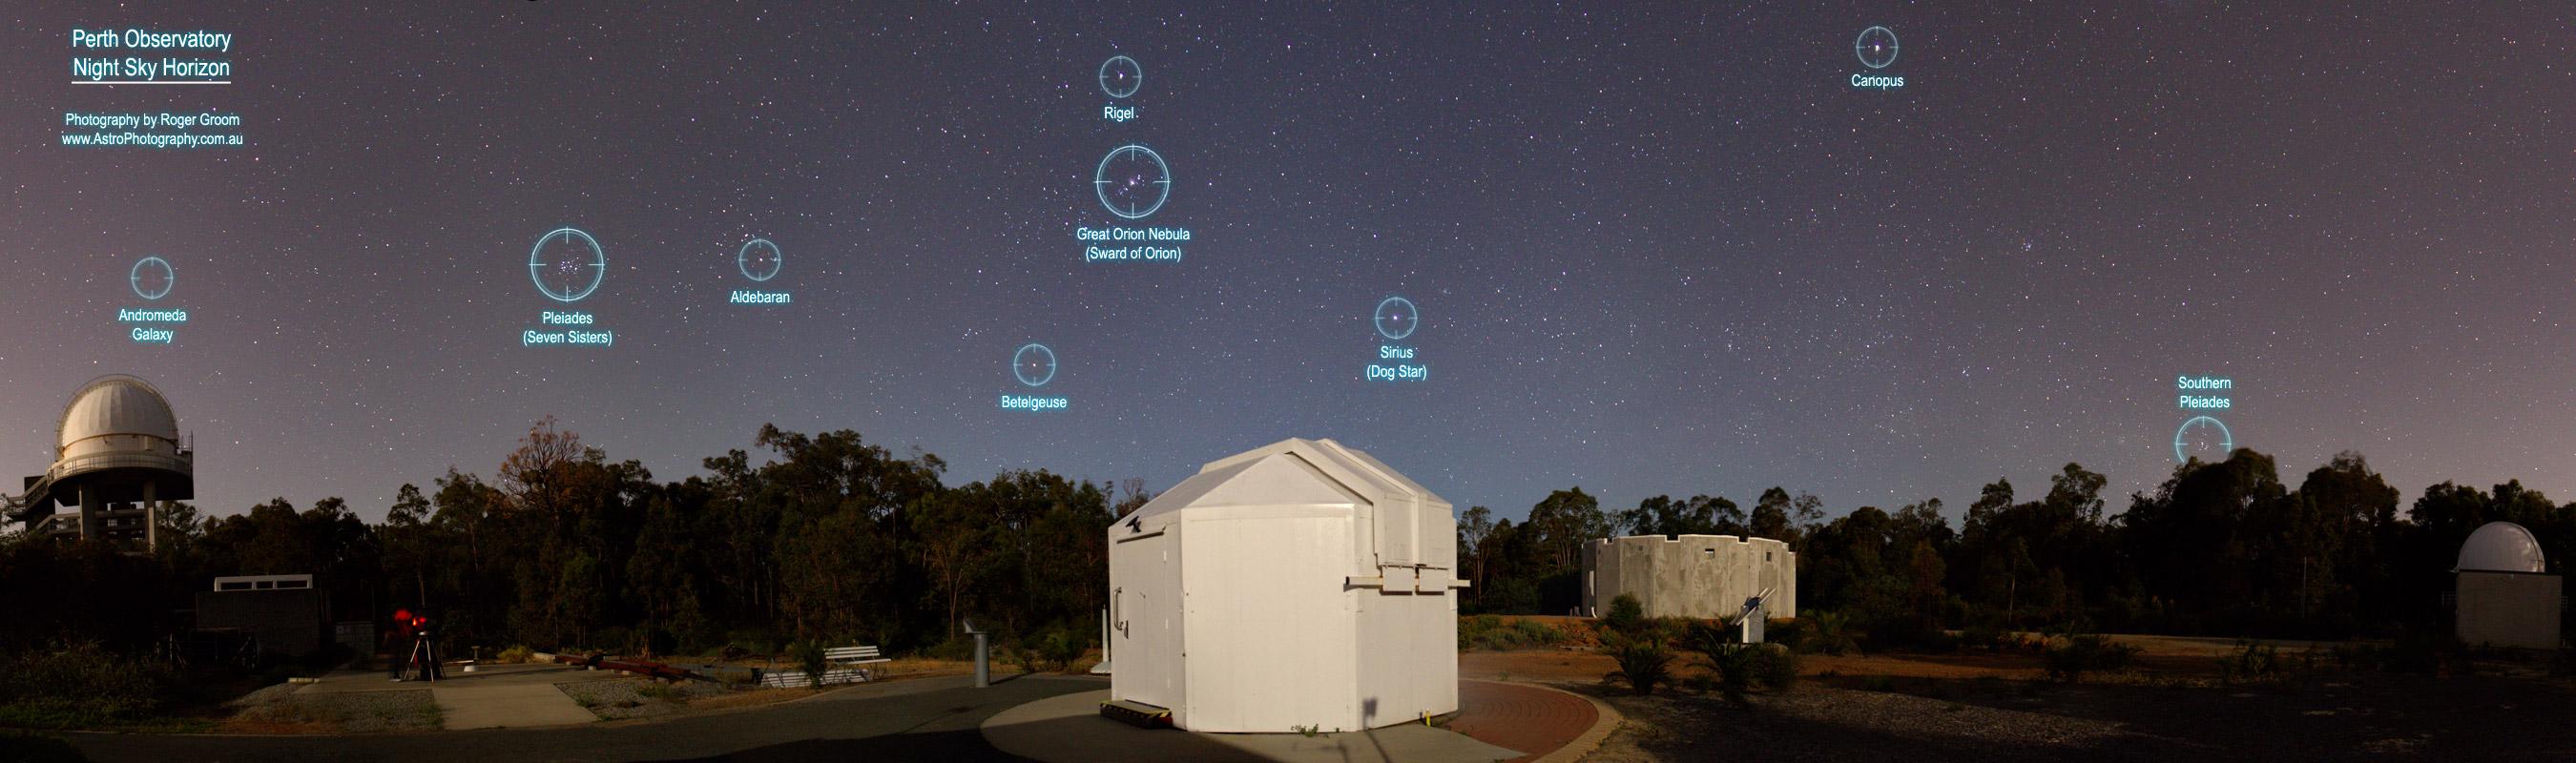 Perth Observatory Night Sky Horizon